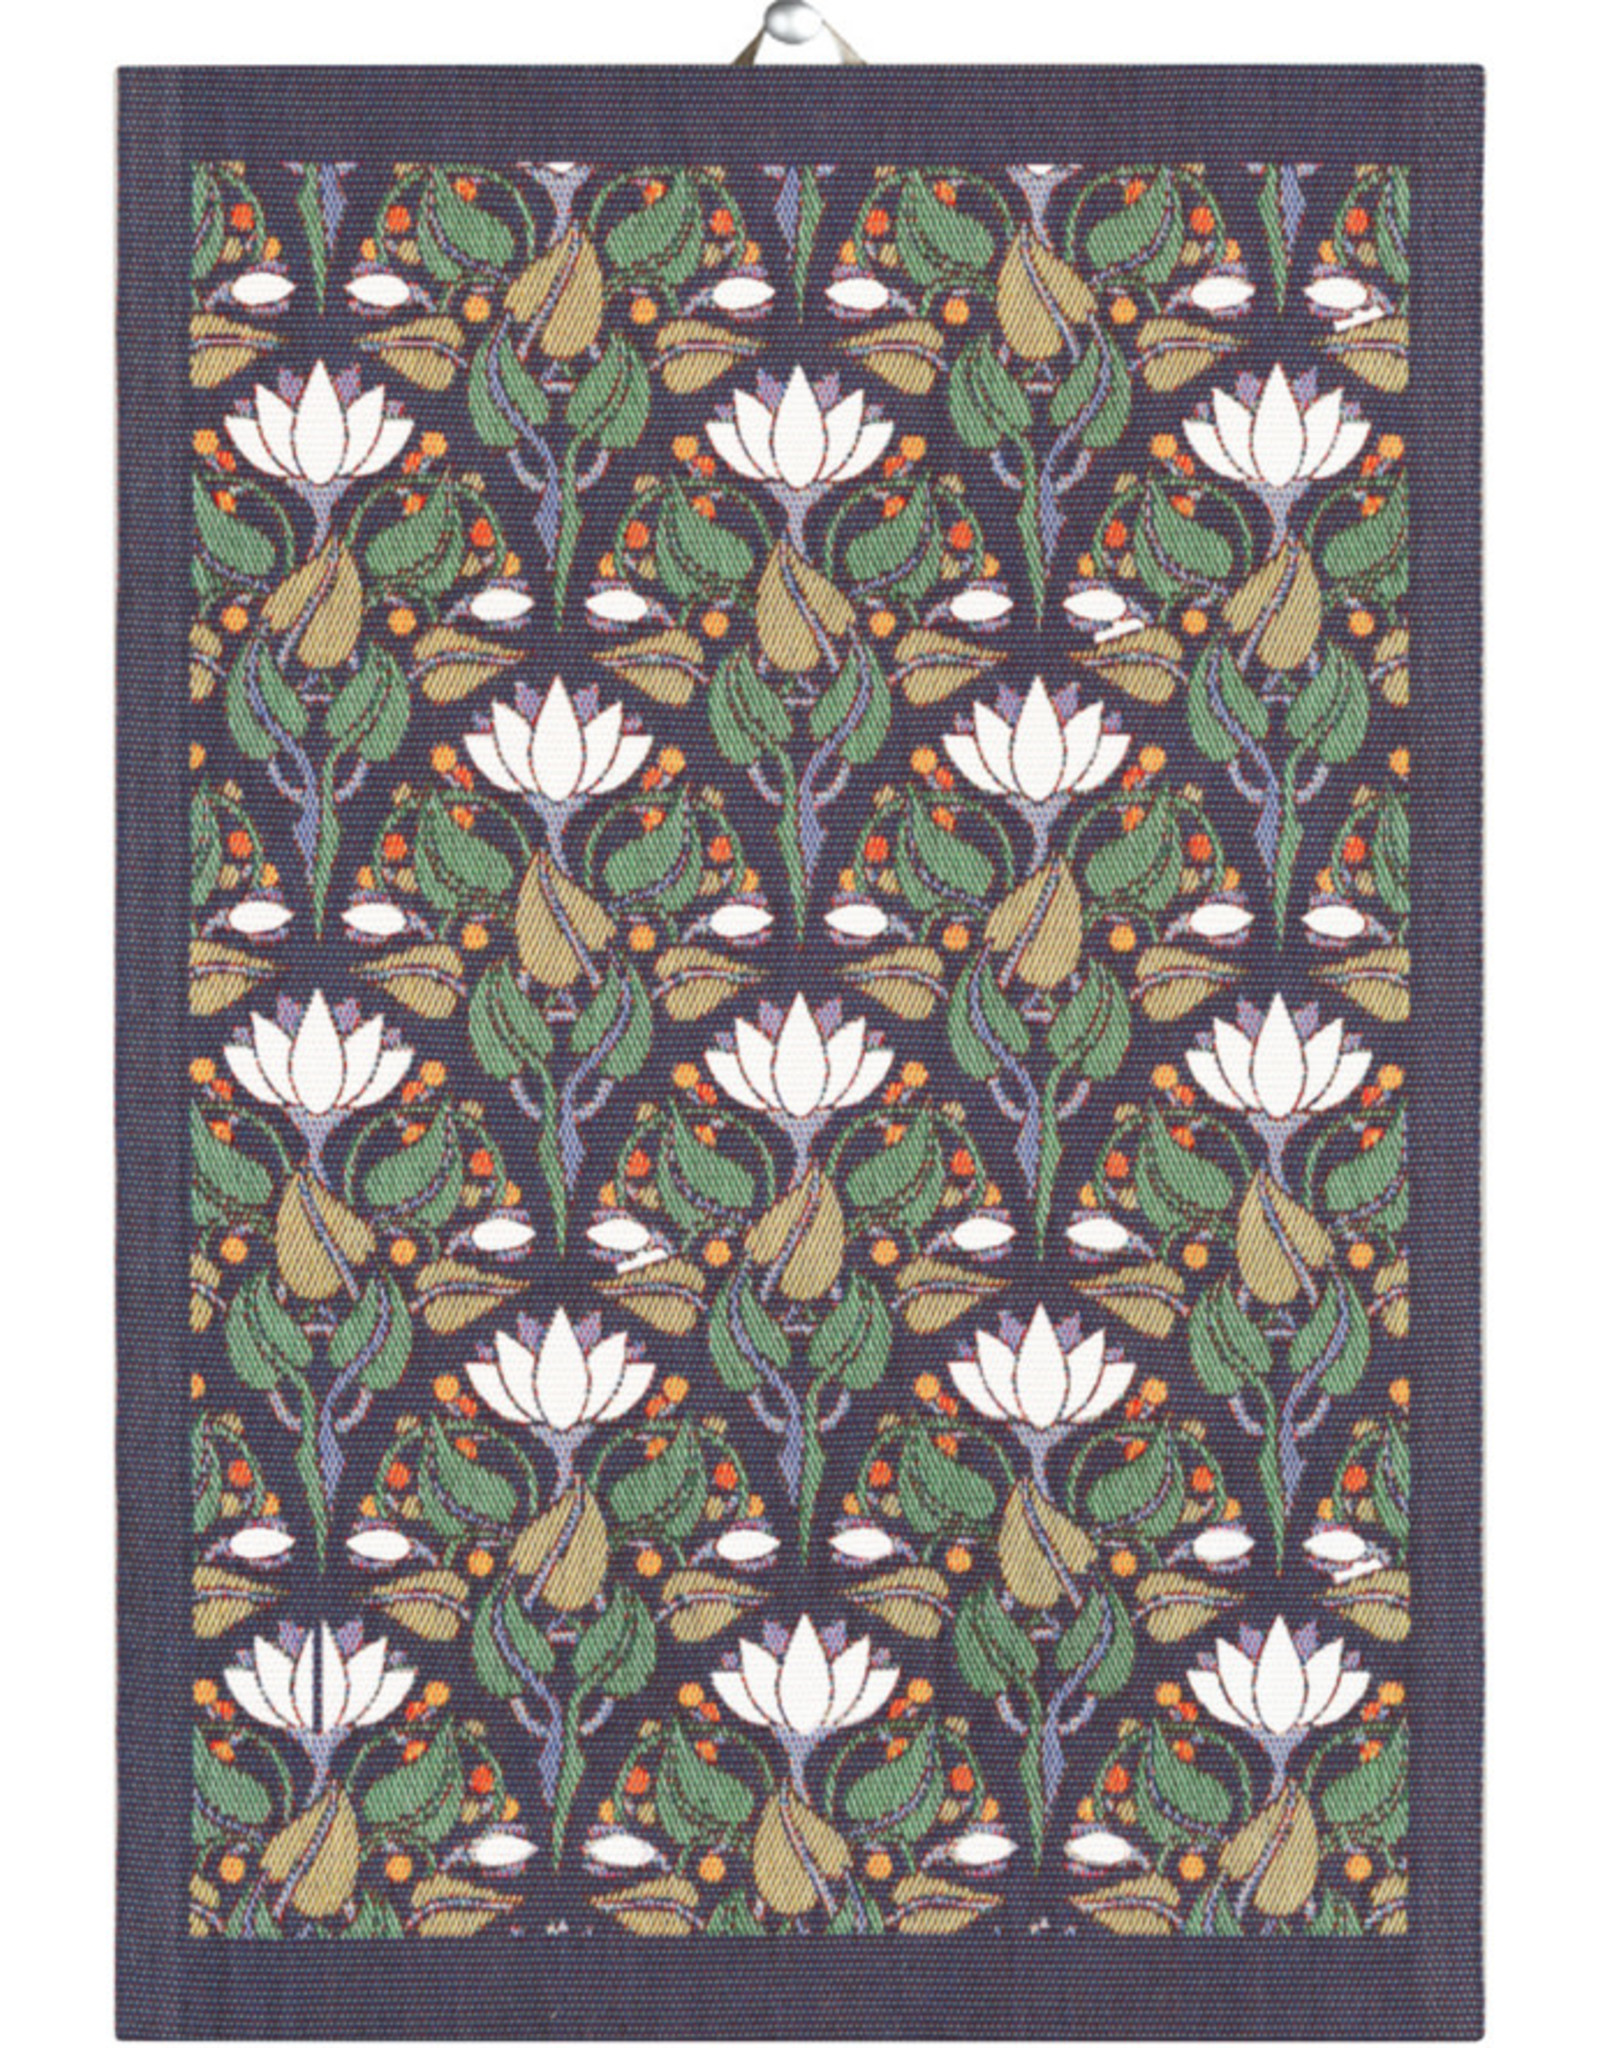 Lilies Tea Towel